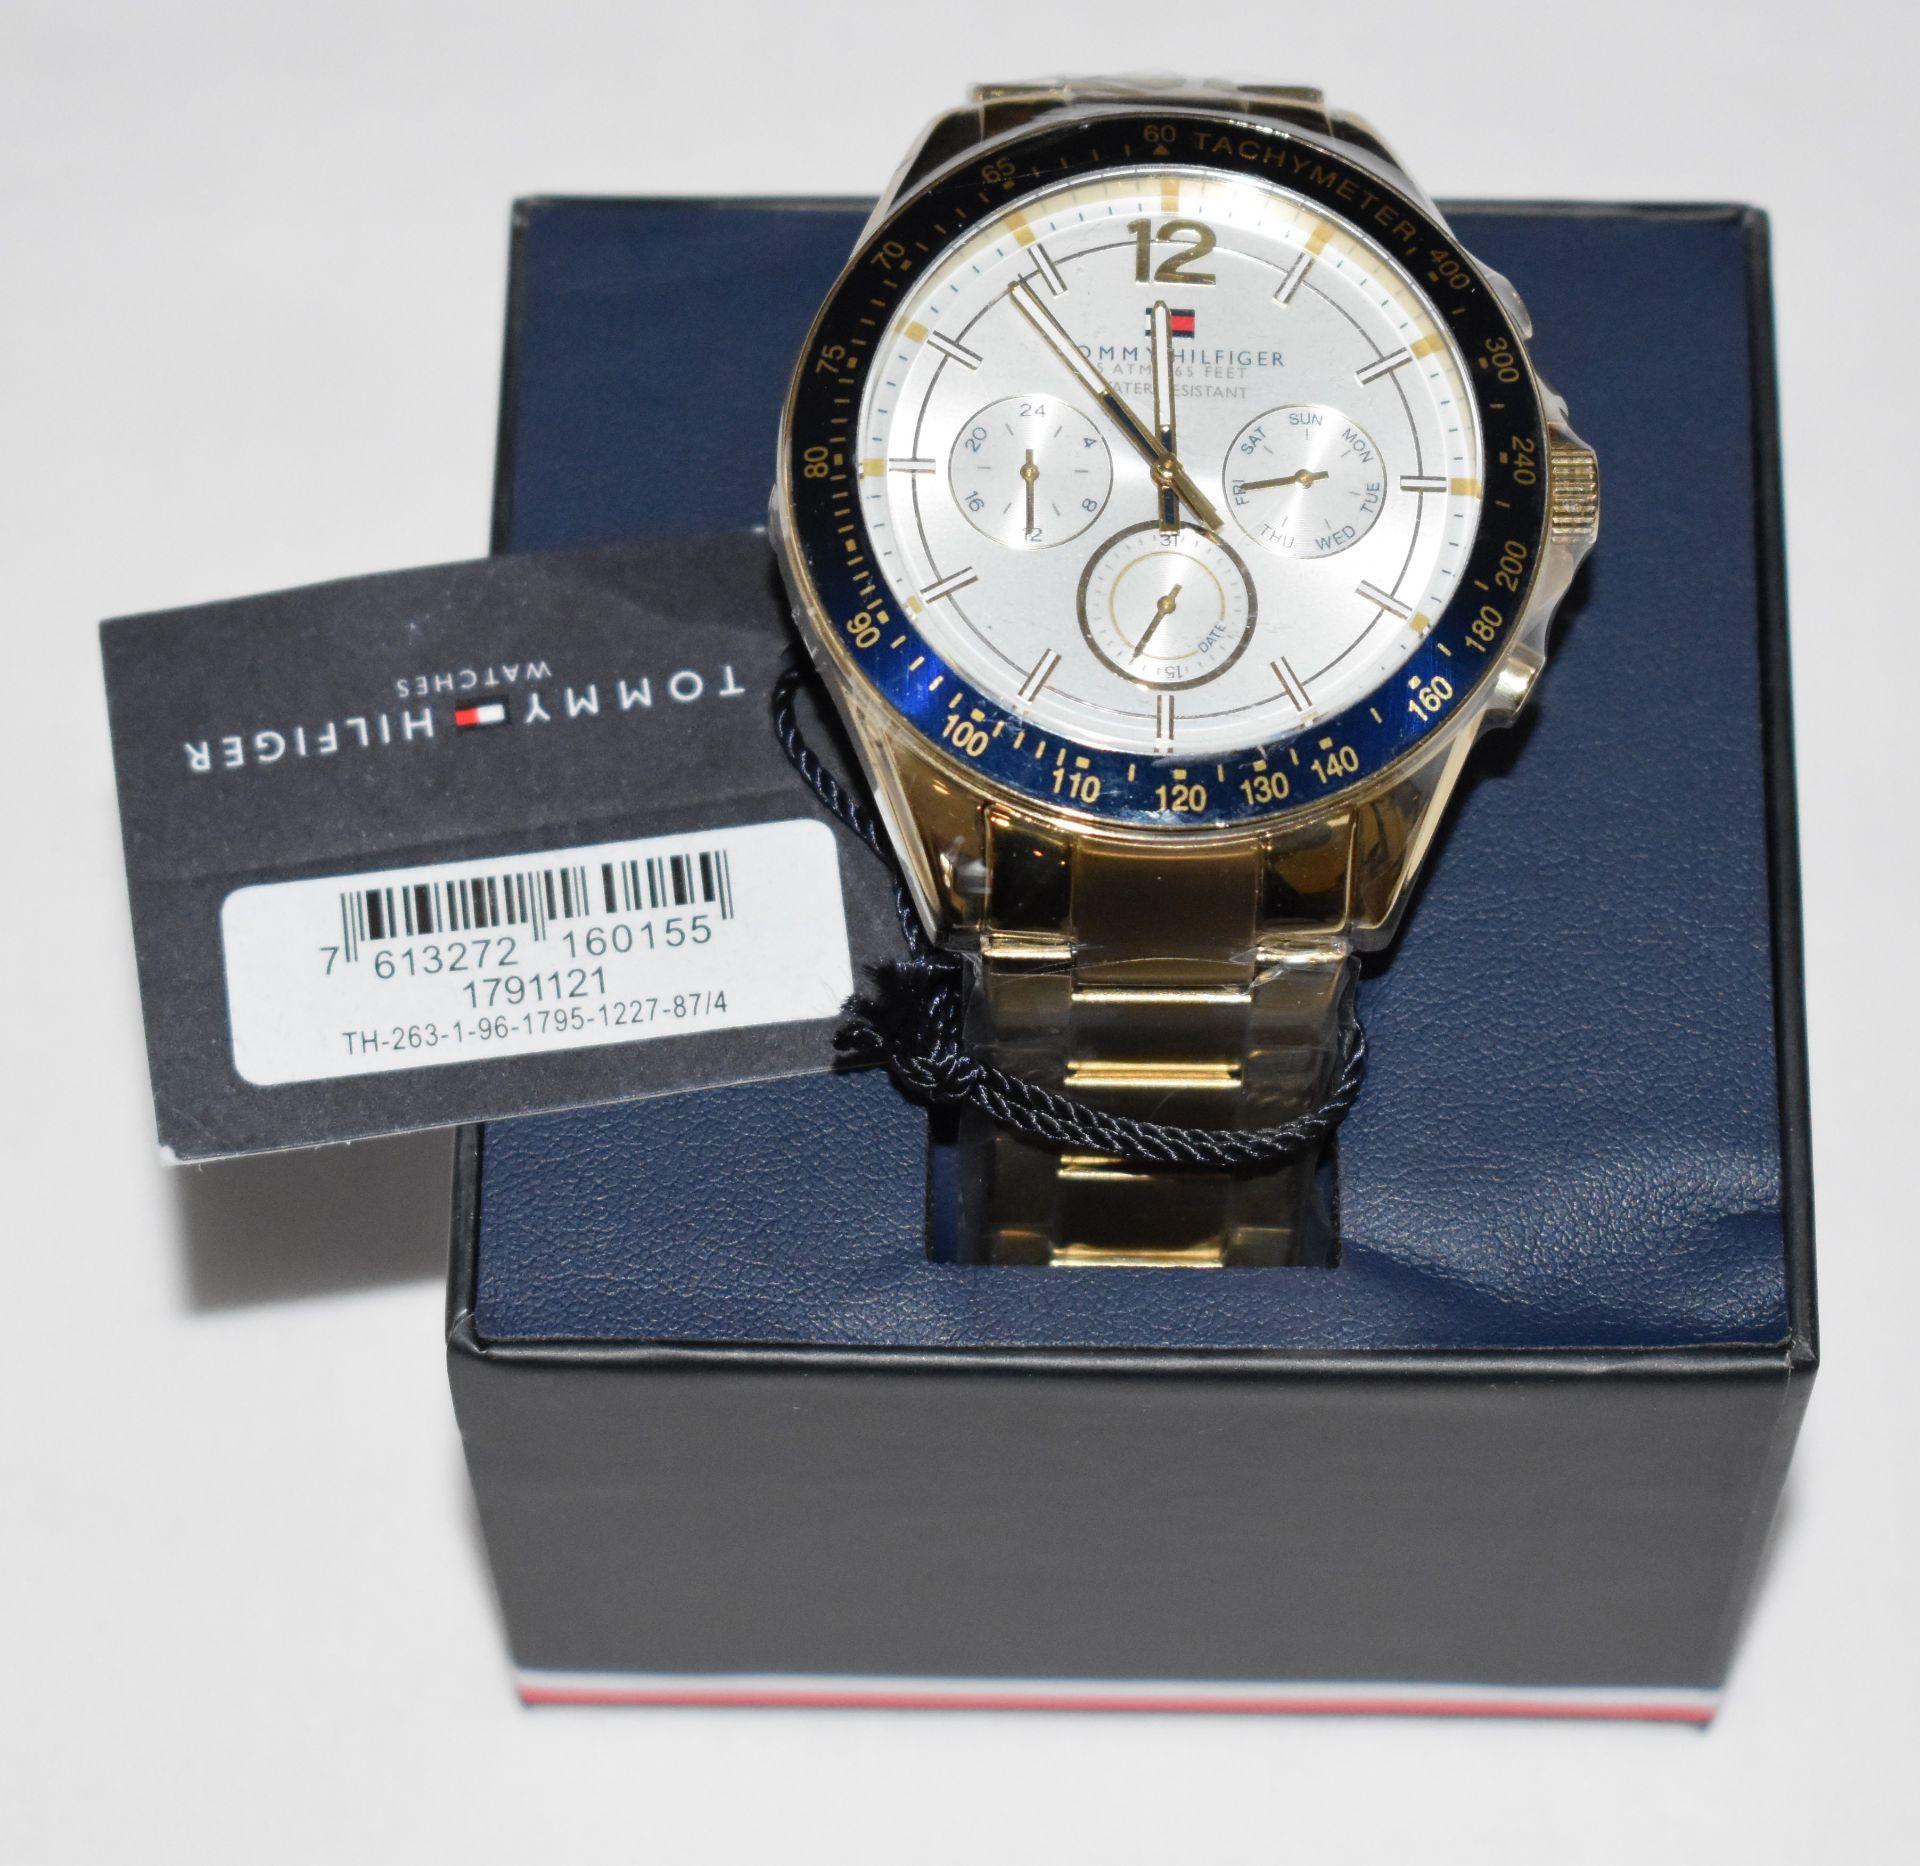 Tommy Hilfiger Men's Watch 1791121 - Image 2 of 2